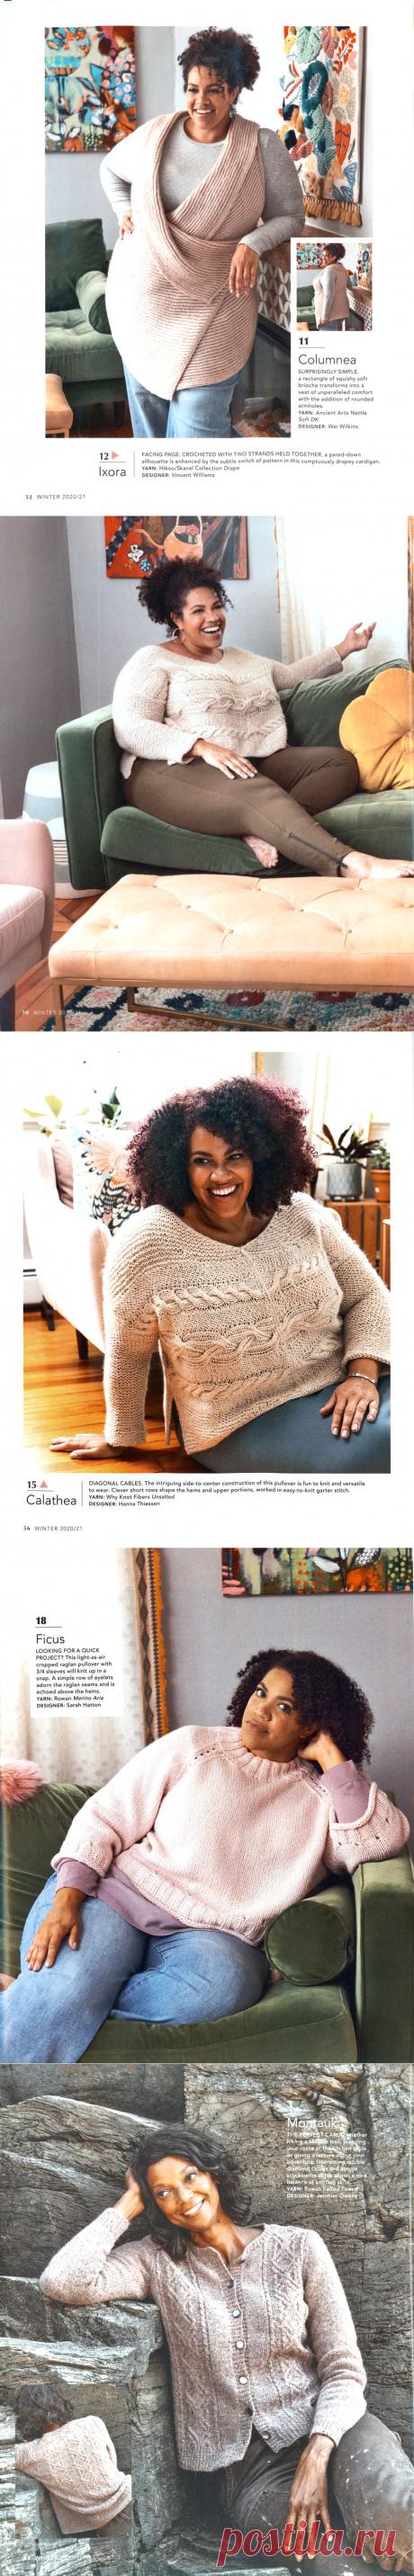 Vogue Knitting Winter 2020/21